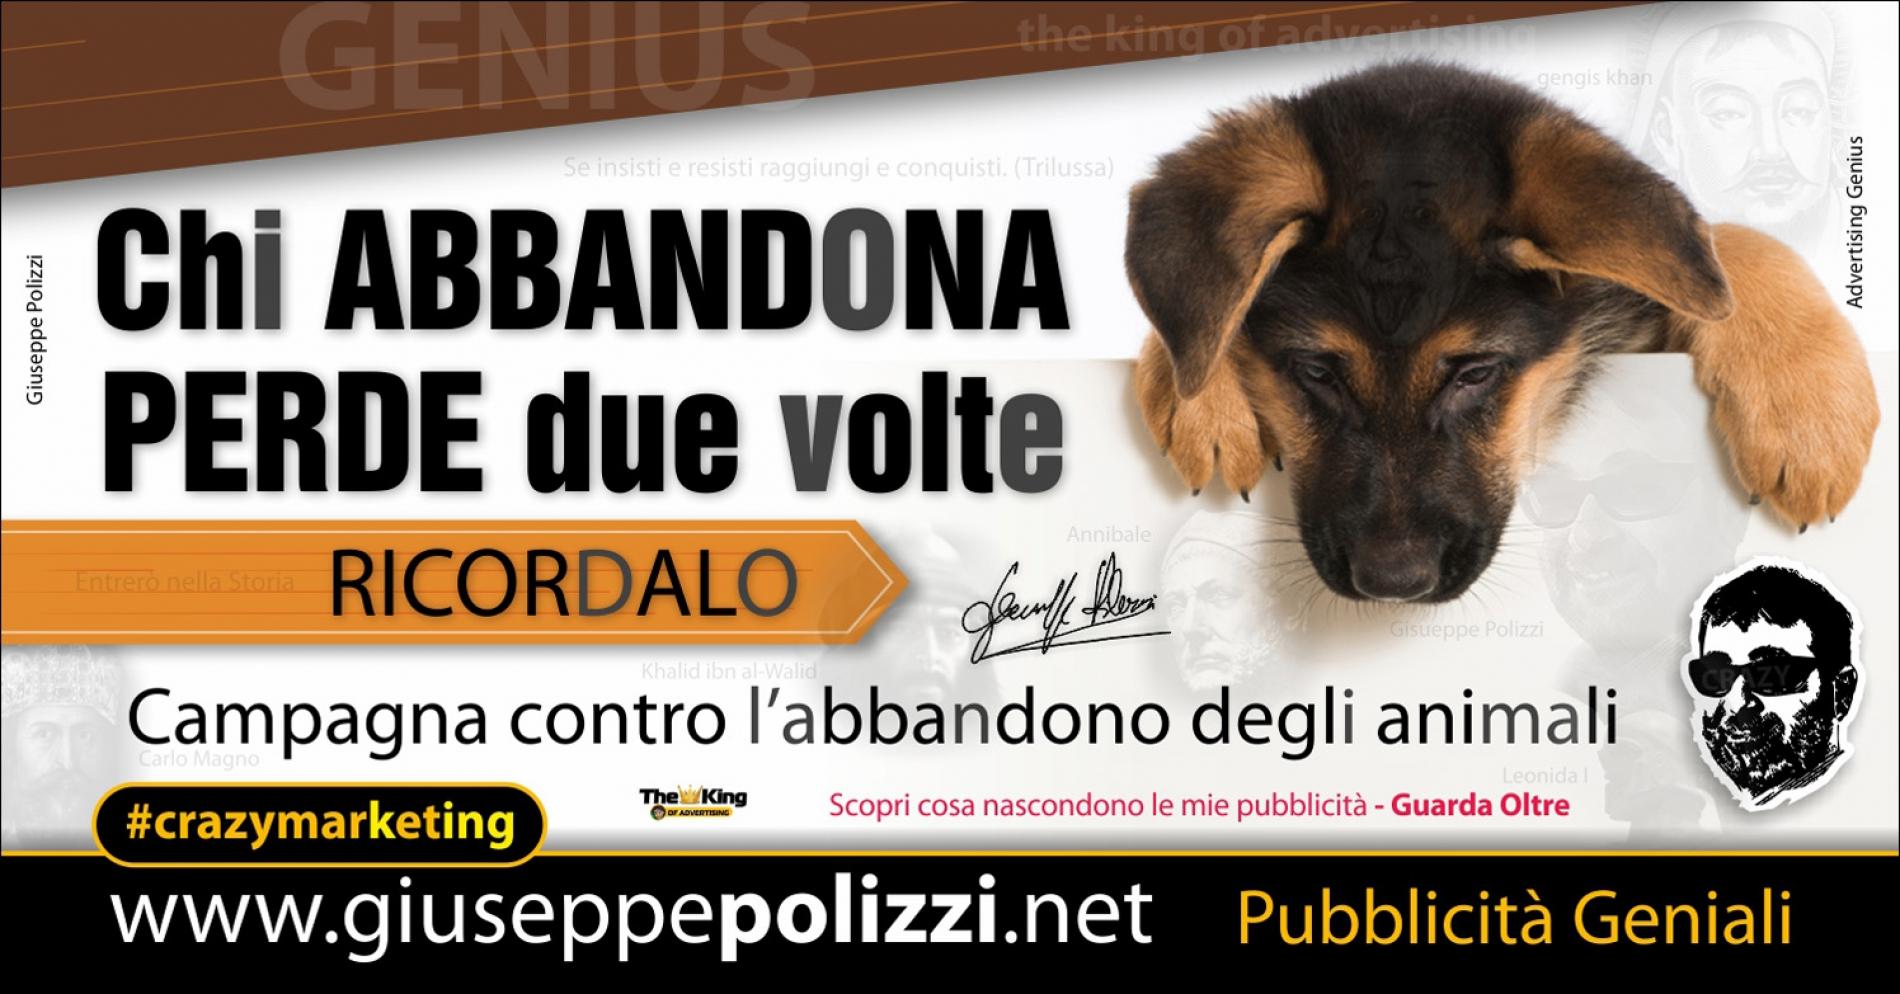 giuseppe Polizzi pubblicita Chi abbandona perde 2 volte crazymarketing genius